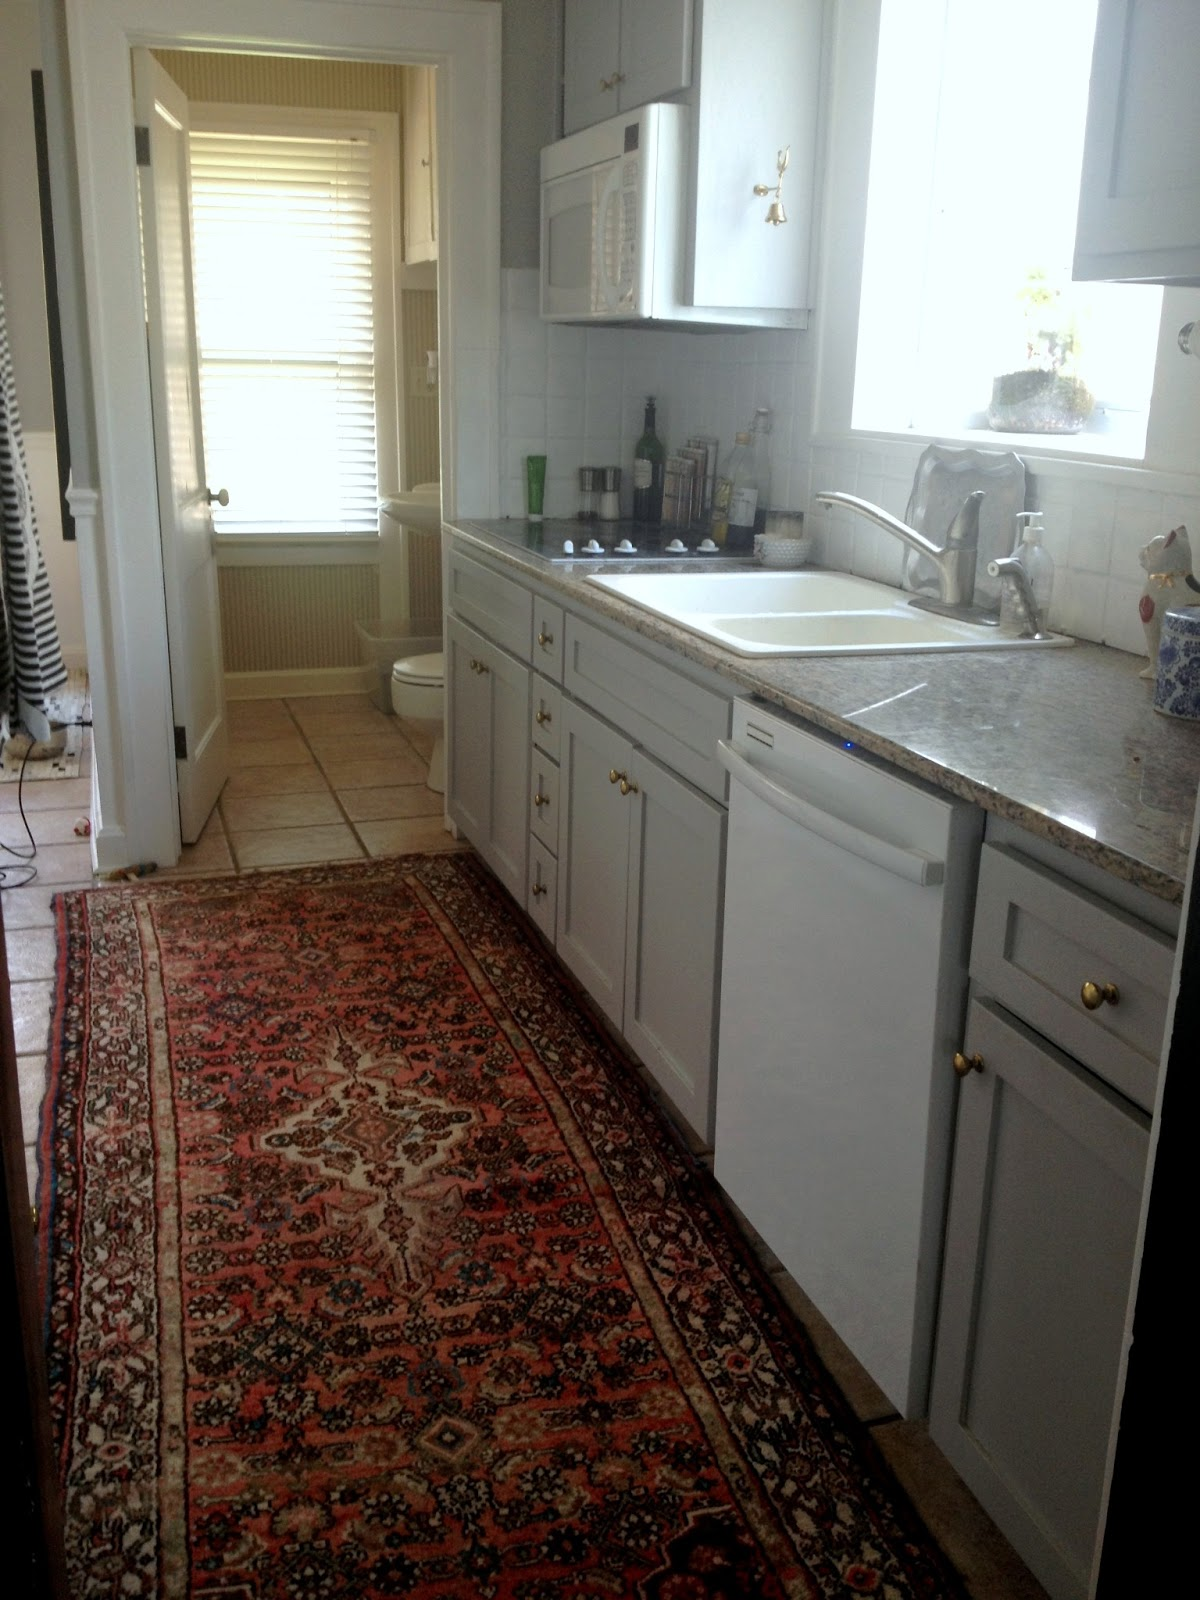 ■kitchen floor Inspiringwords Kitchen Floor Runners Carpet For